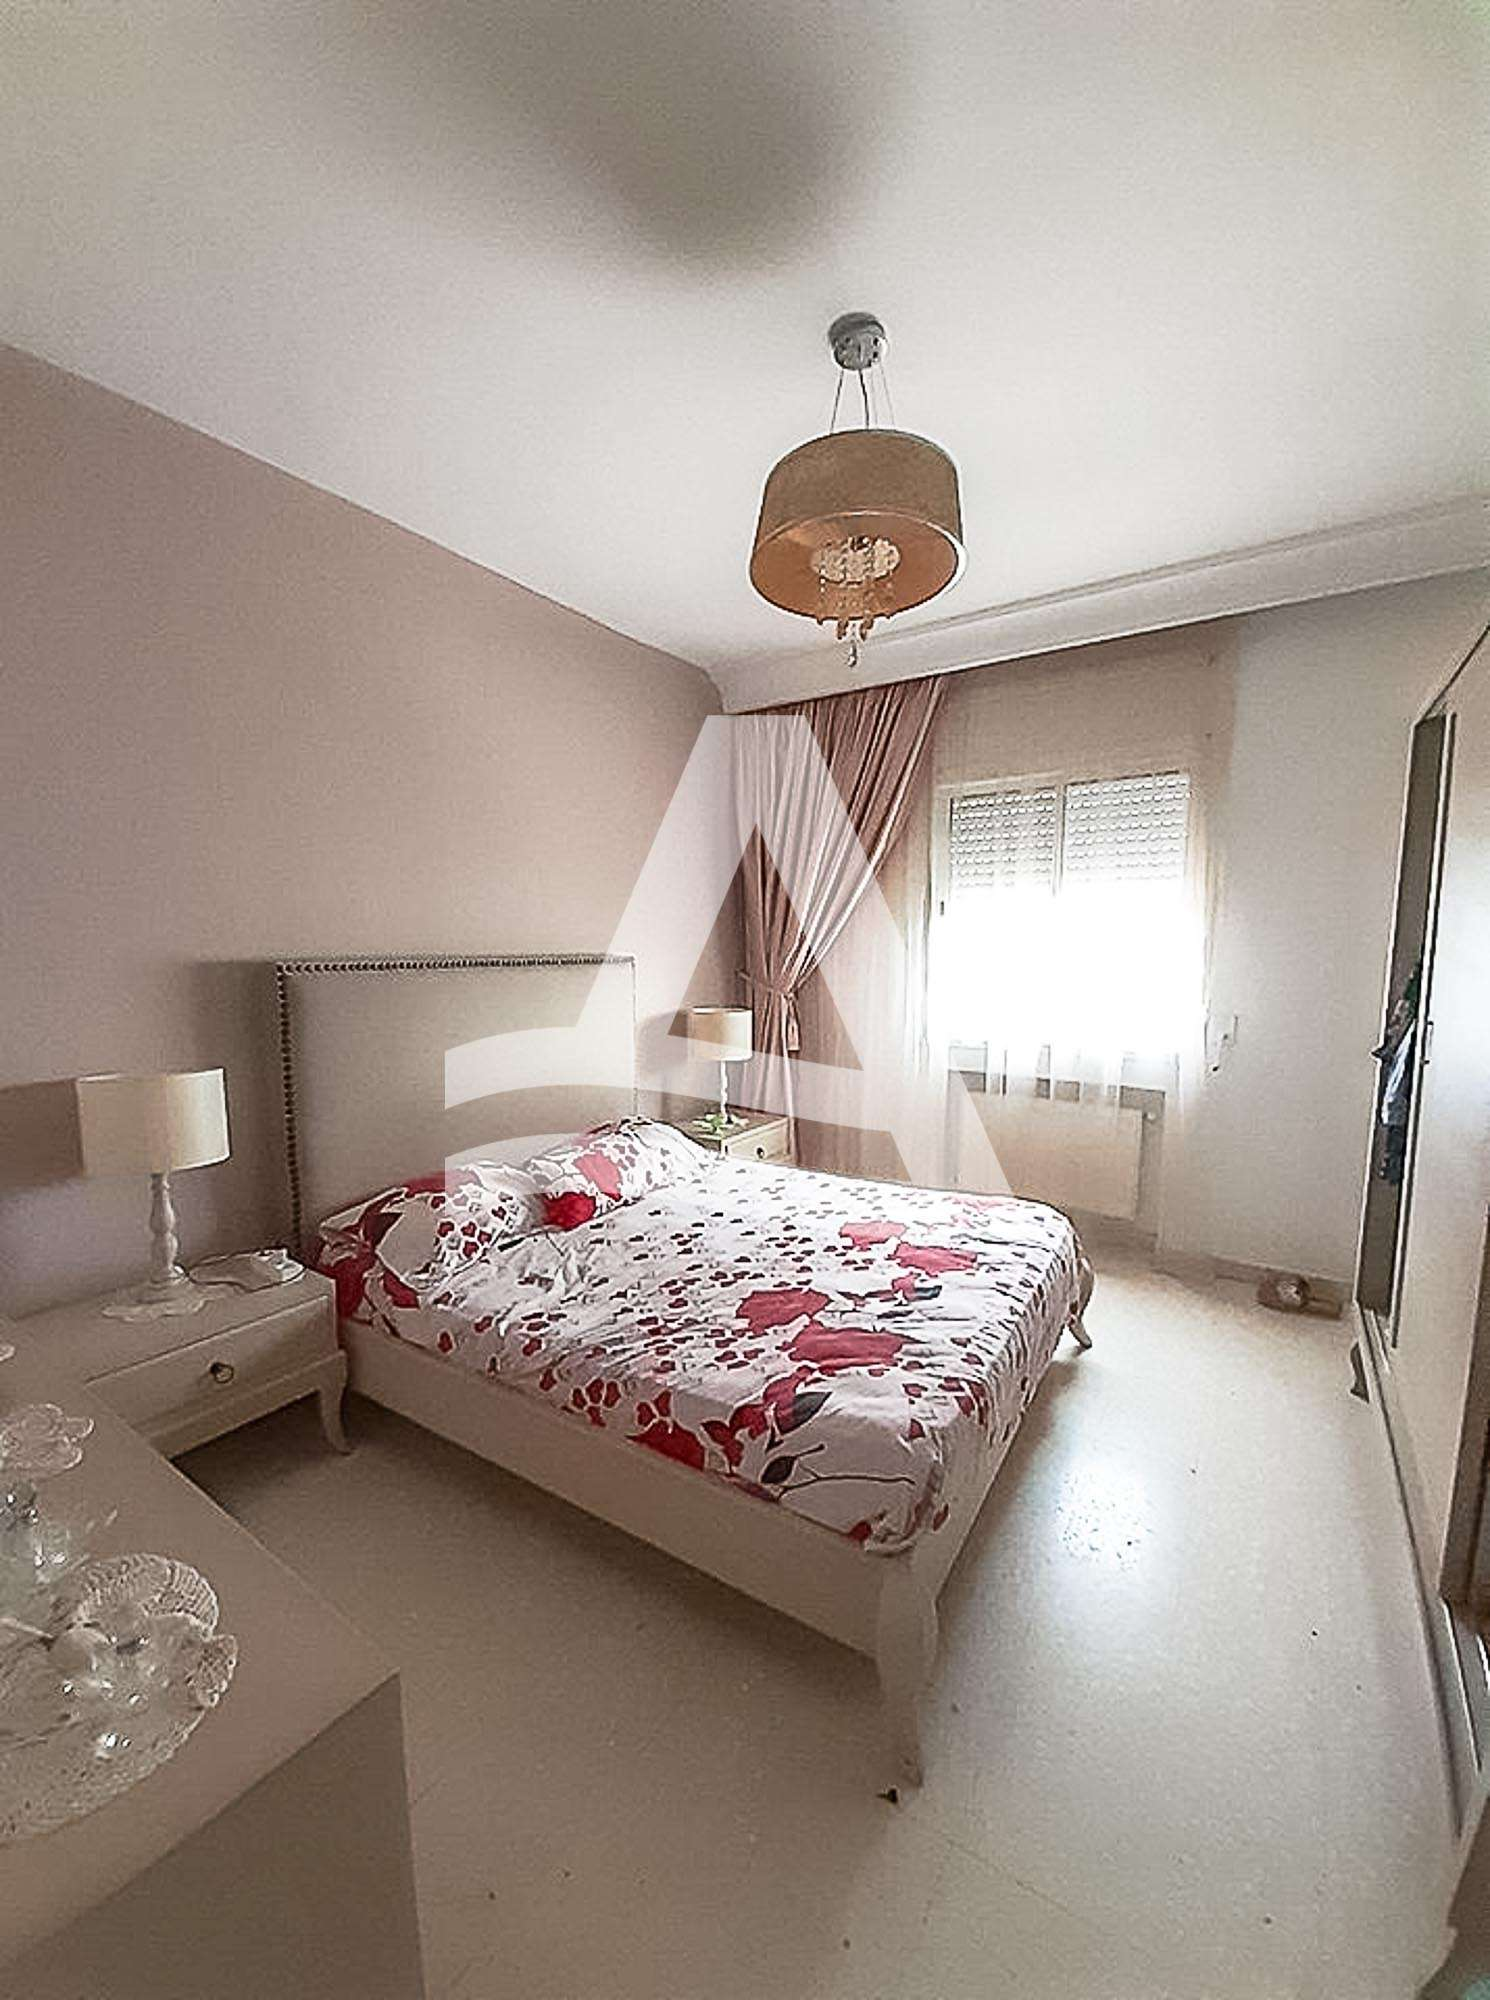 httpss3.amazonaws.comlogimoaws_Arcane_immobilière_la_Marsa-_location_-_vente_la_marsa_2_sur_16_1574071698403-1